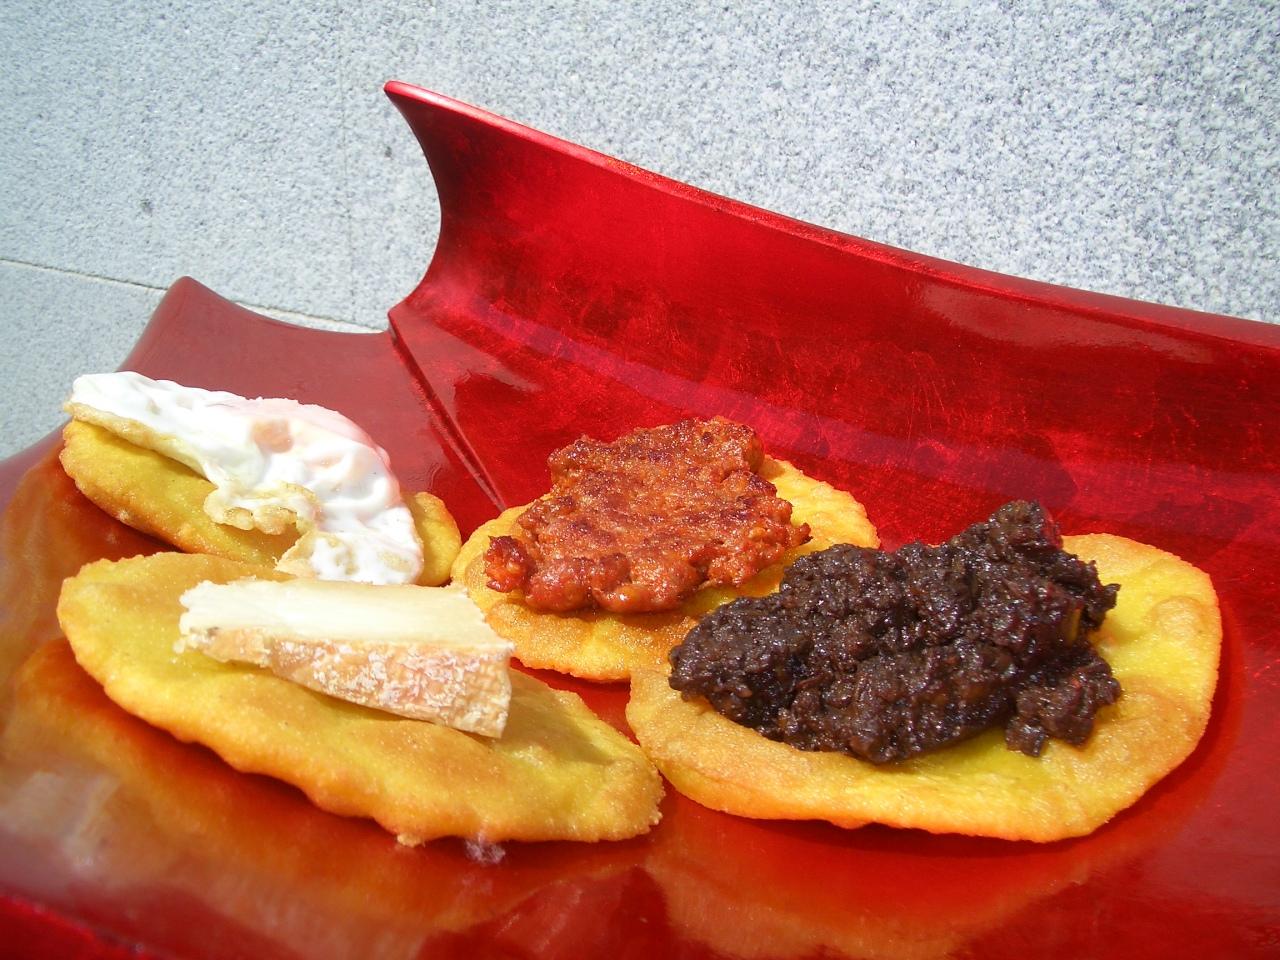 Tortos de Maiz – CornmealTortilla